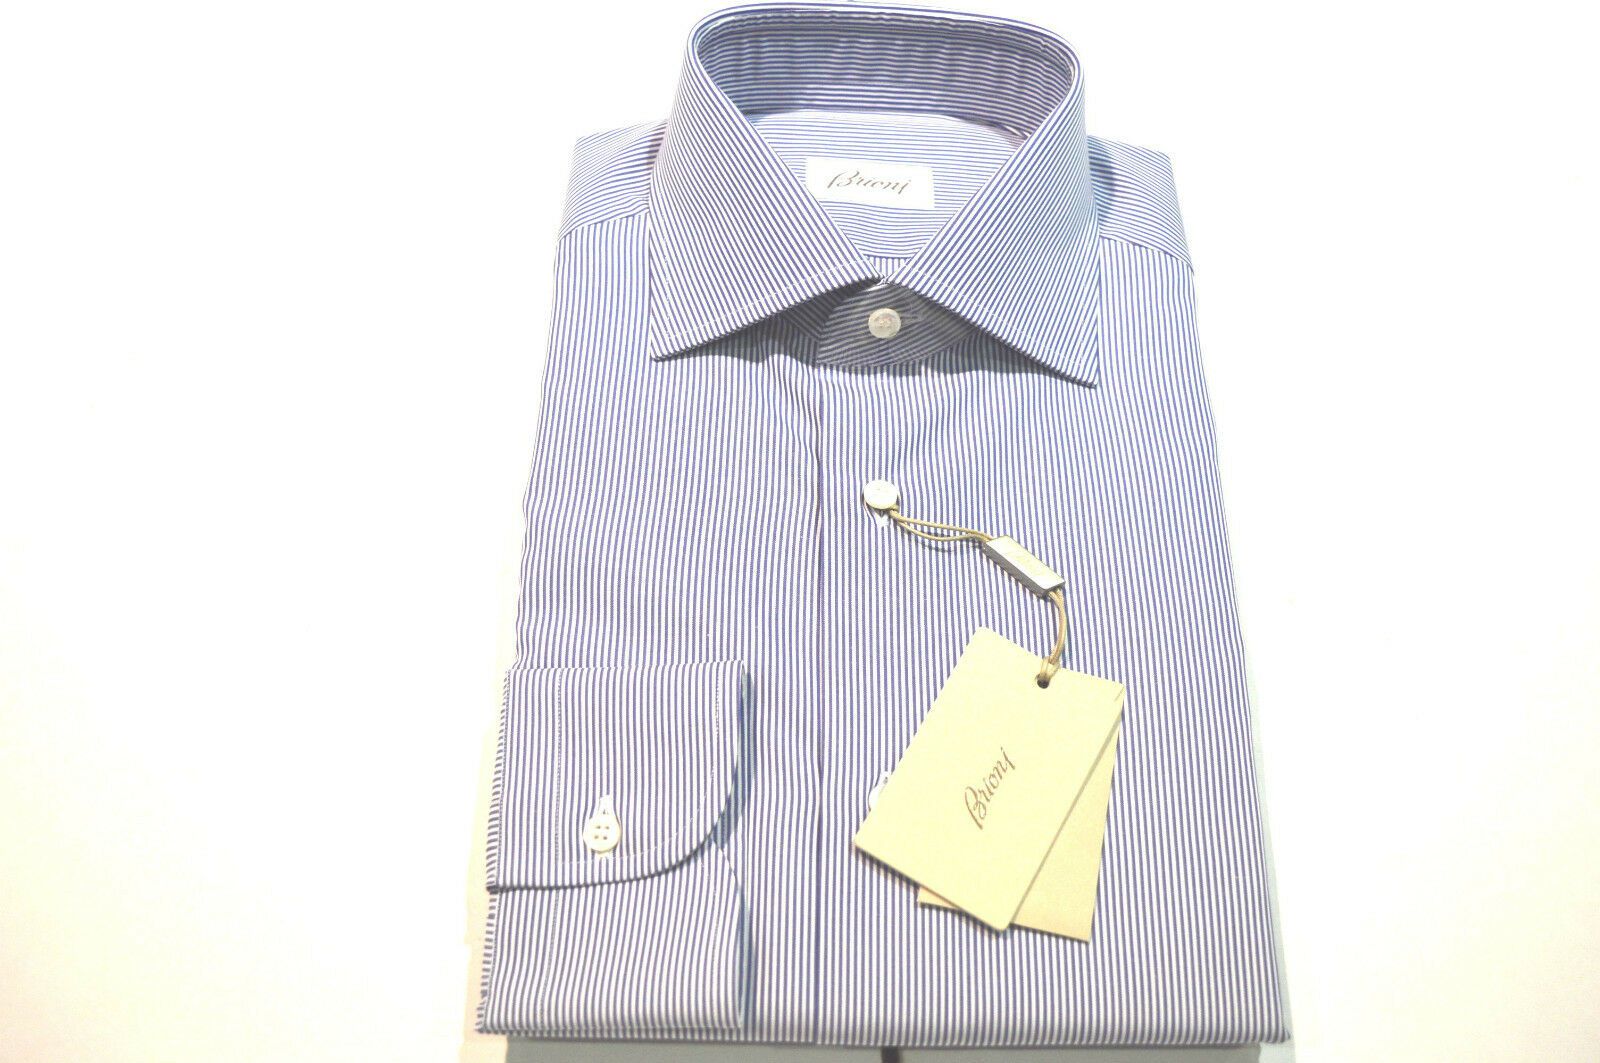 NEW  BRIONI Dress hemd 100% baumwolle Größe 17 Us 43 Eu  (Store Code SE20)